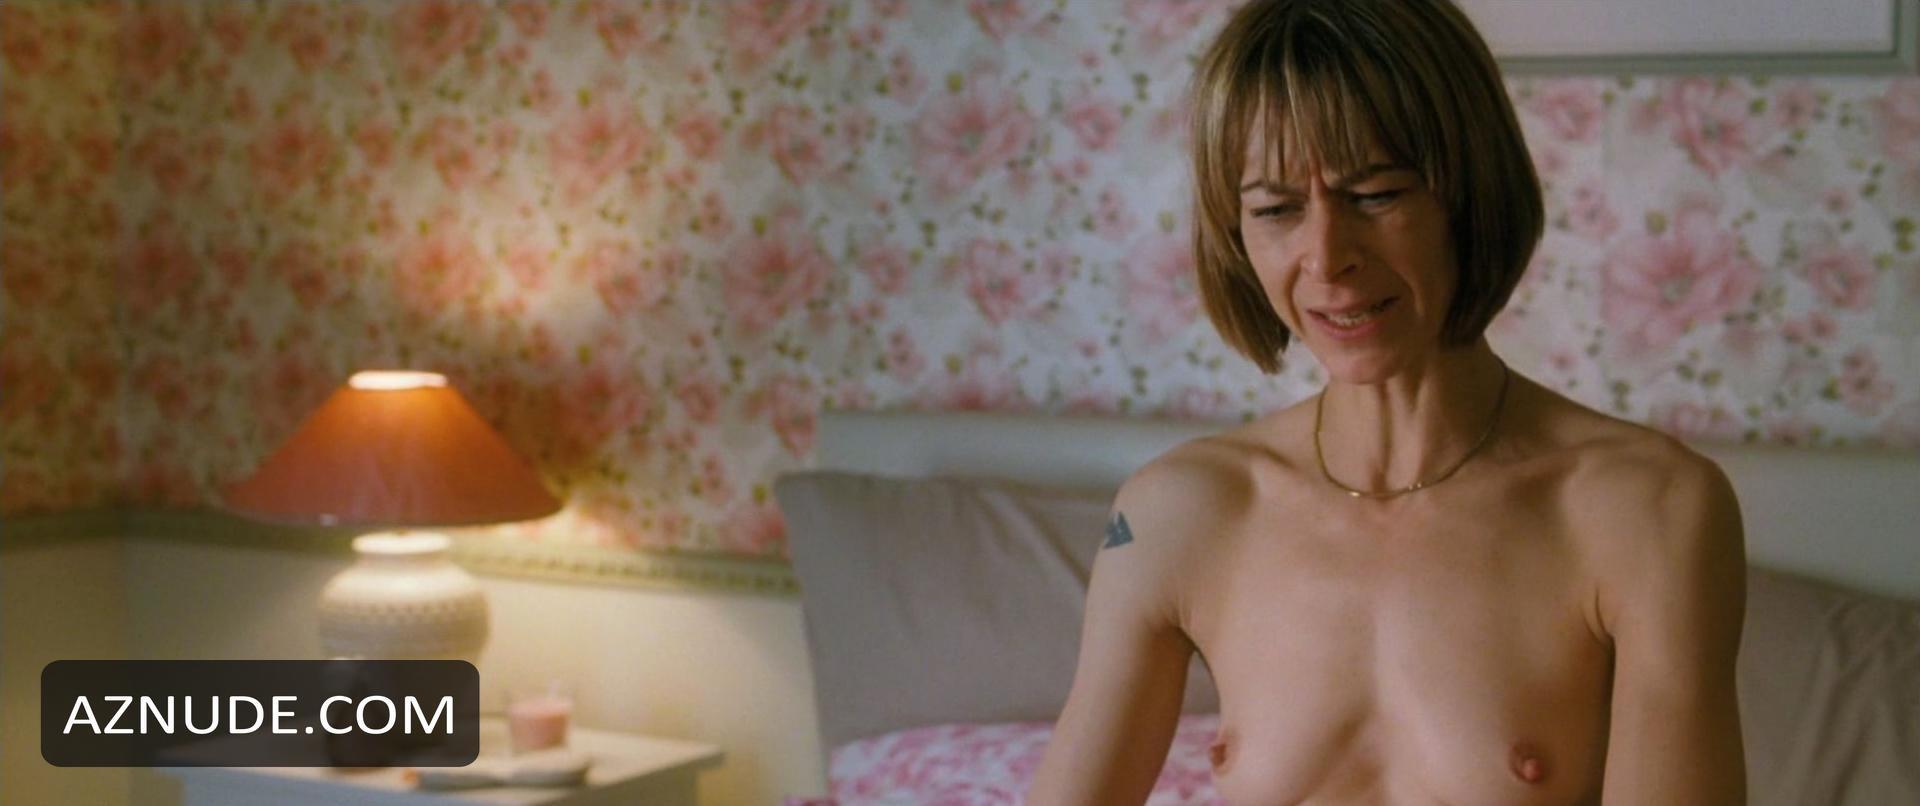 Sue lynn ansari naked - 2019 year